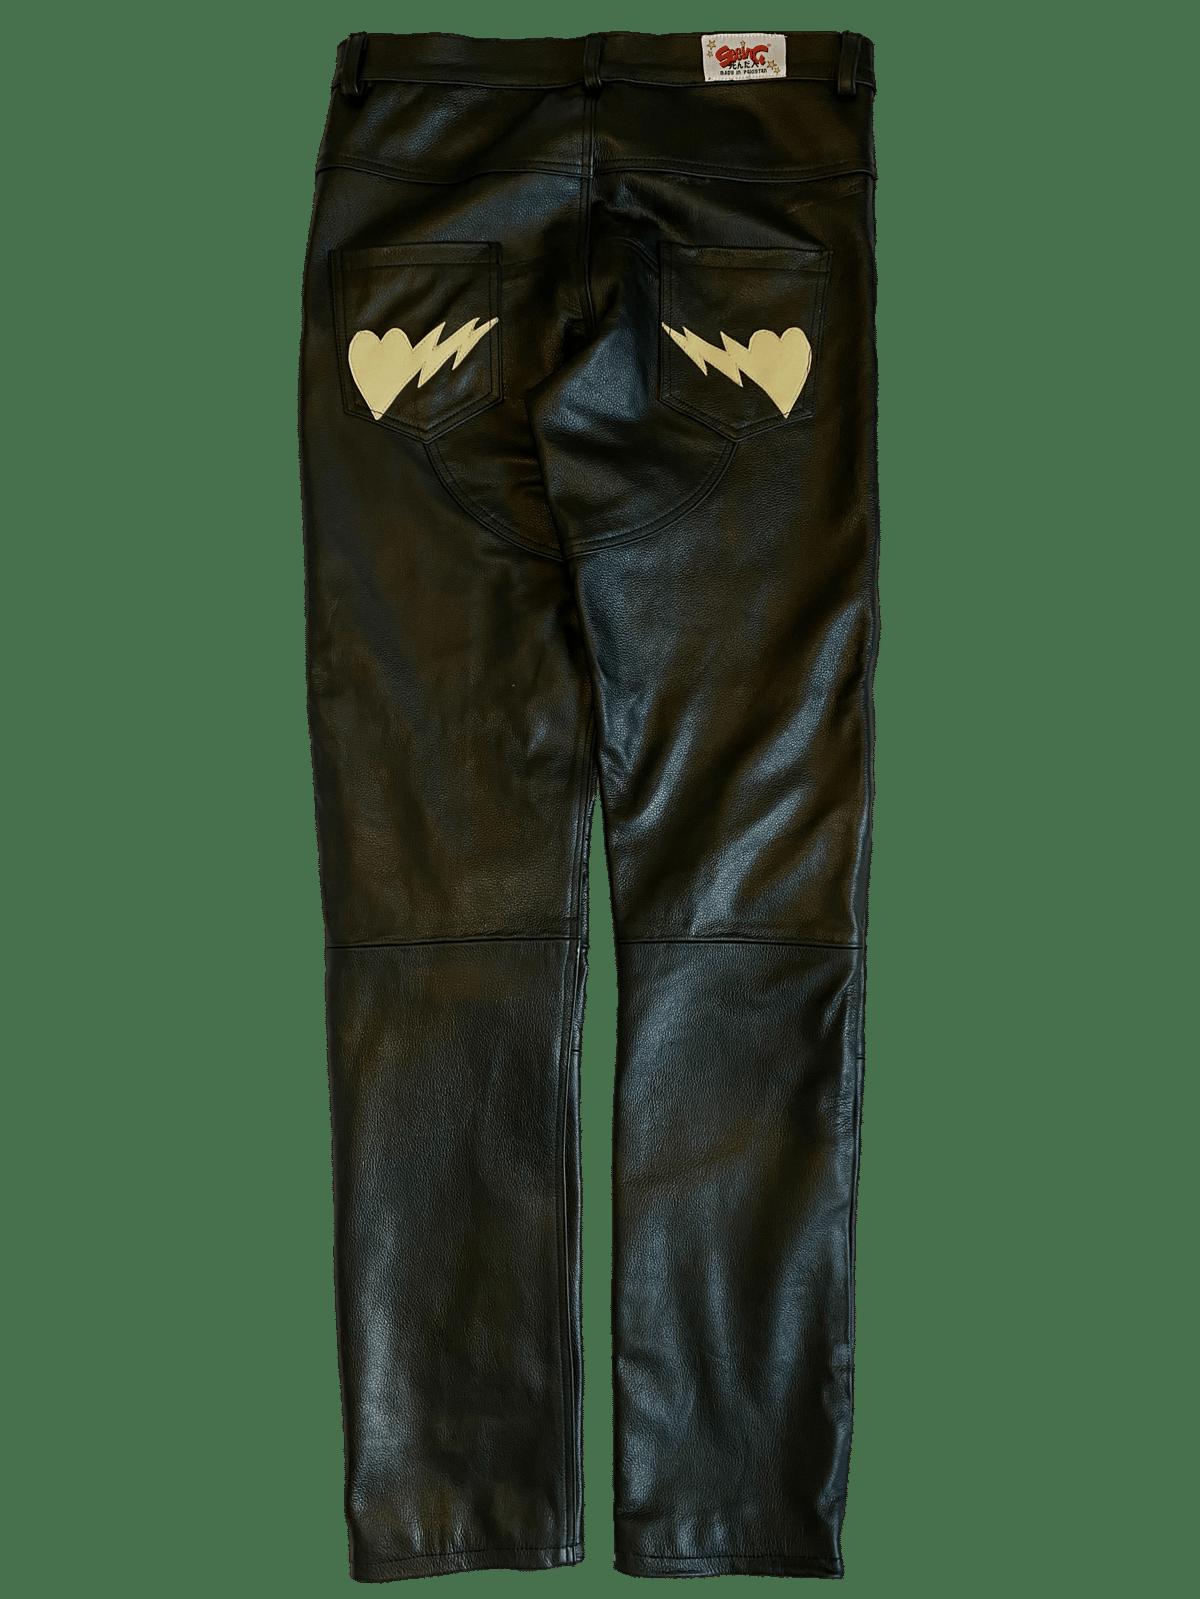 Image of BLACK/CREAM BIKER BONES LEATHER PANTS